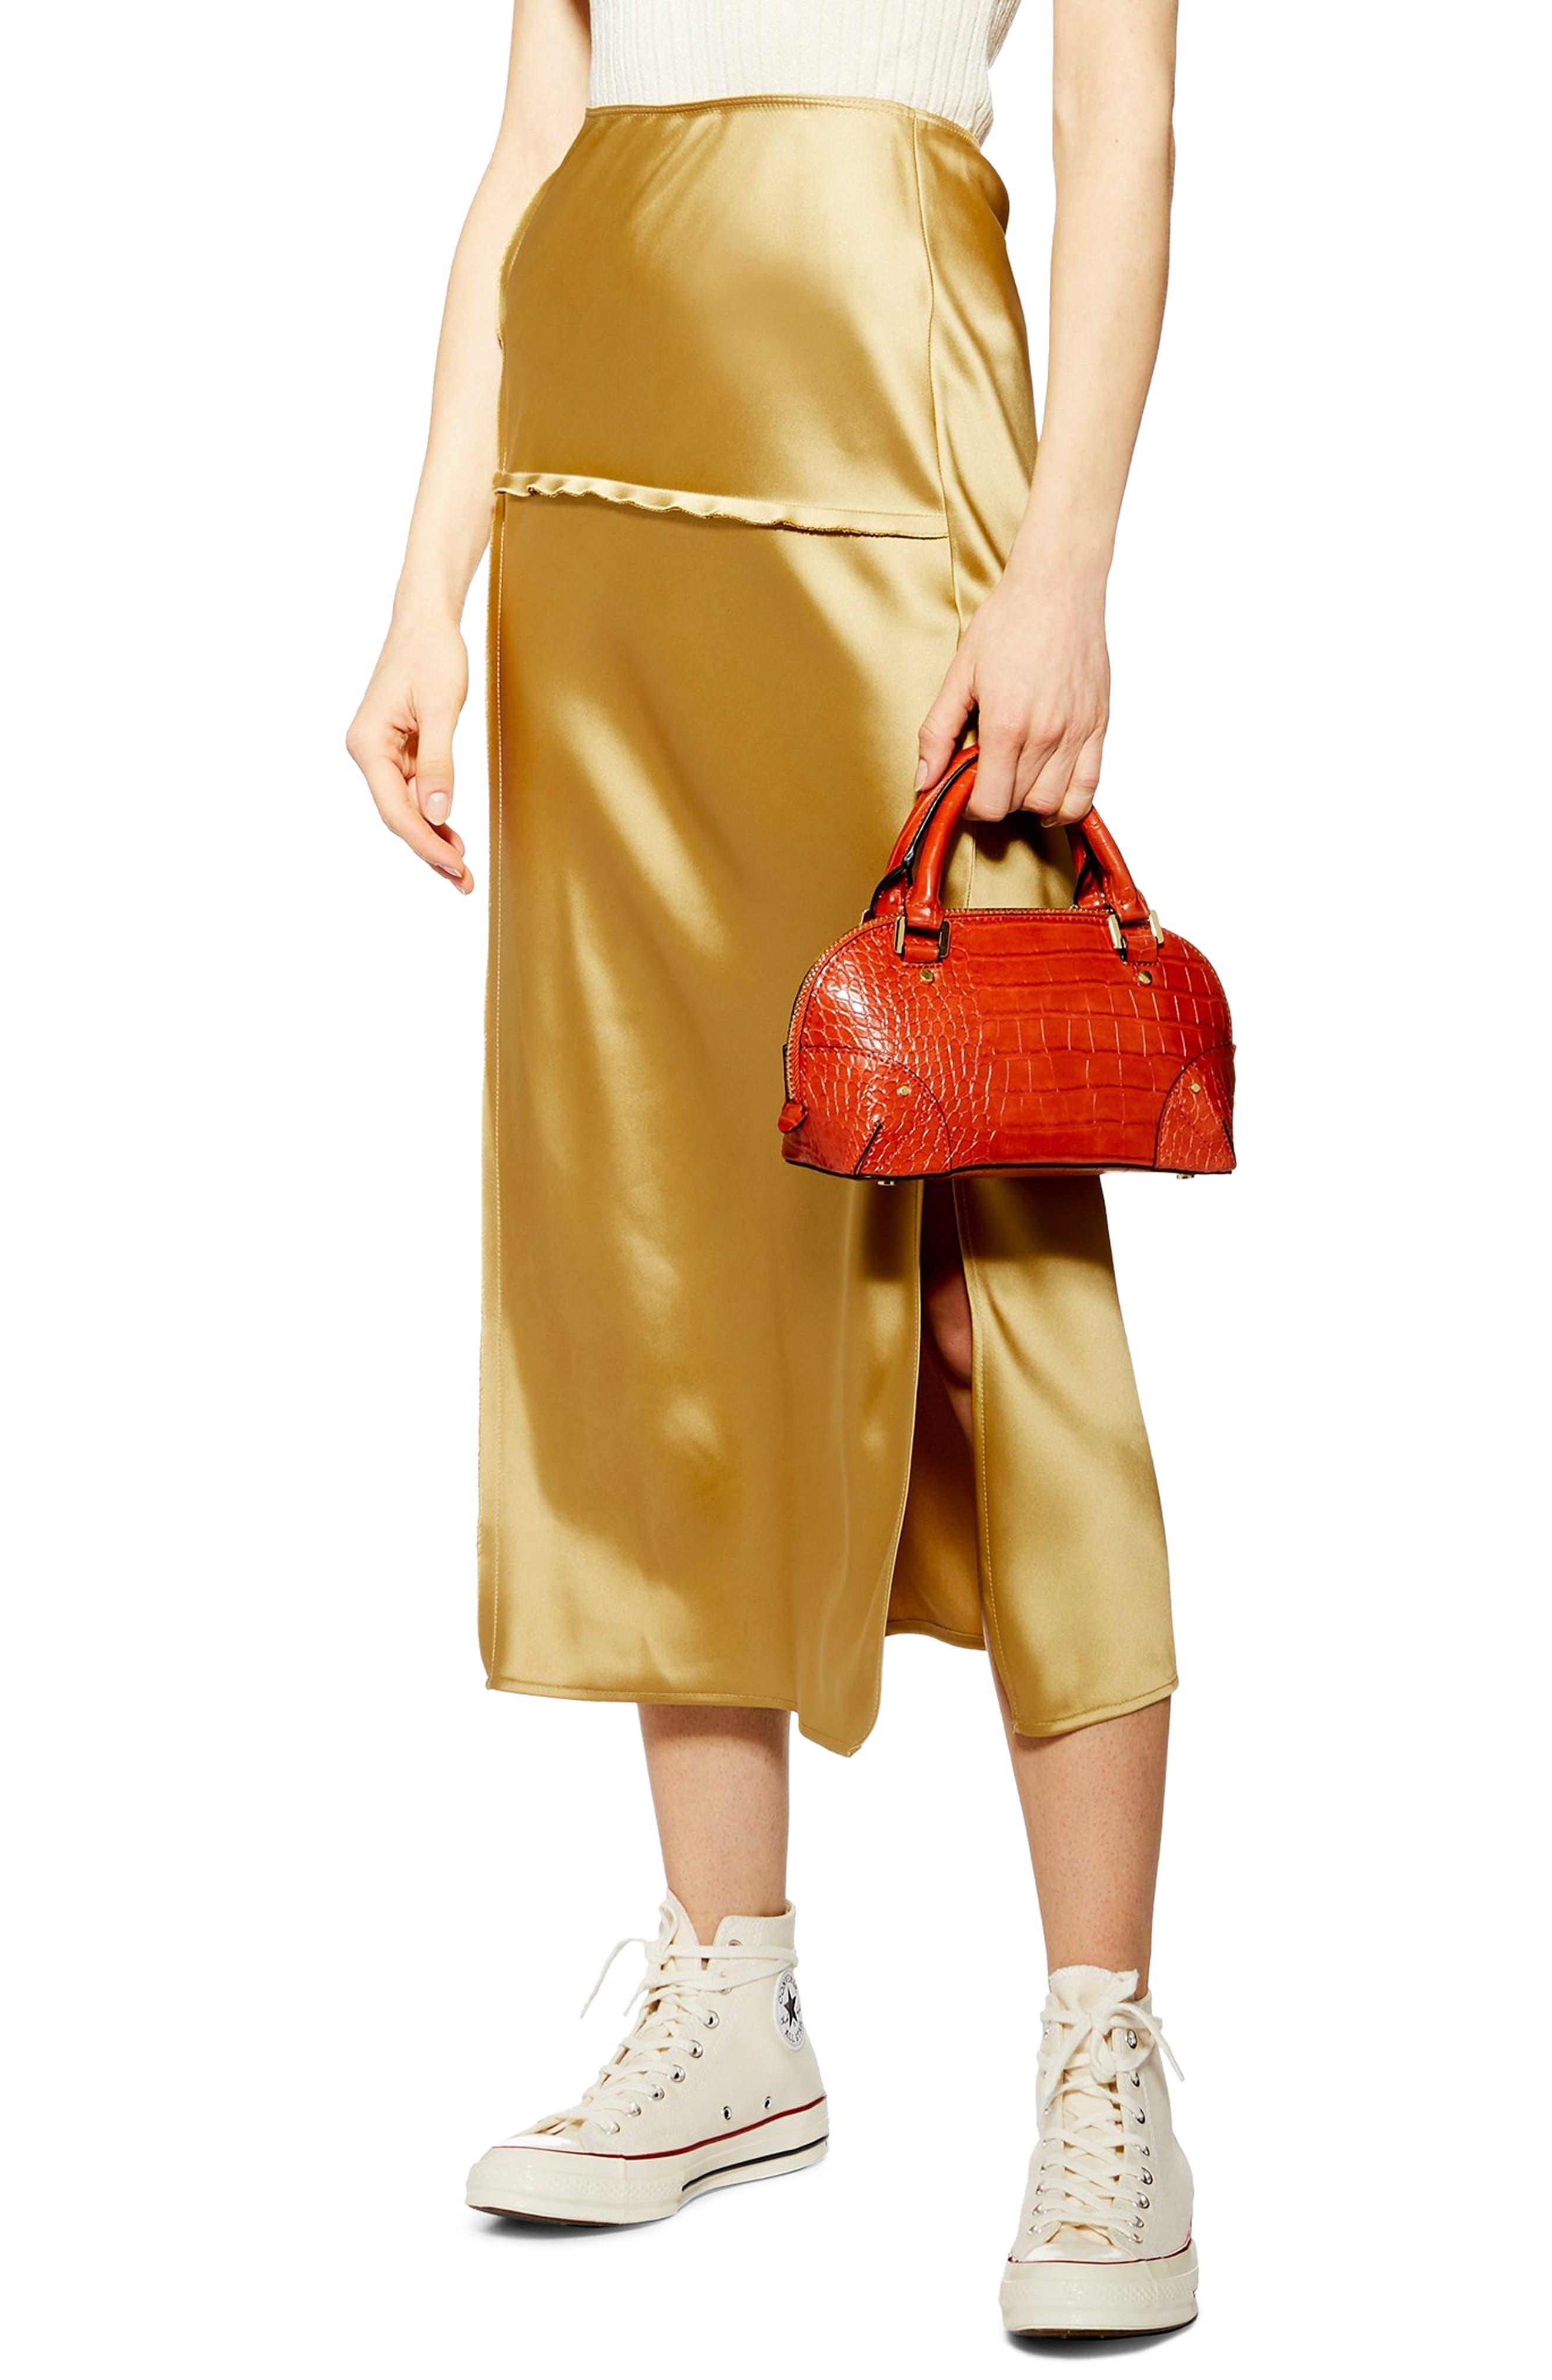 Topshop Bias Cut Midi Skirt, US (fits like 14) - Metallic